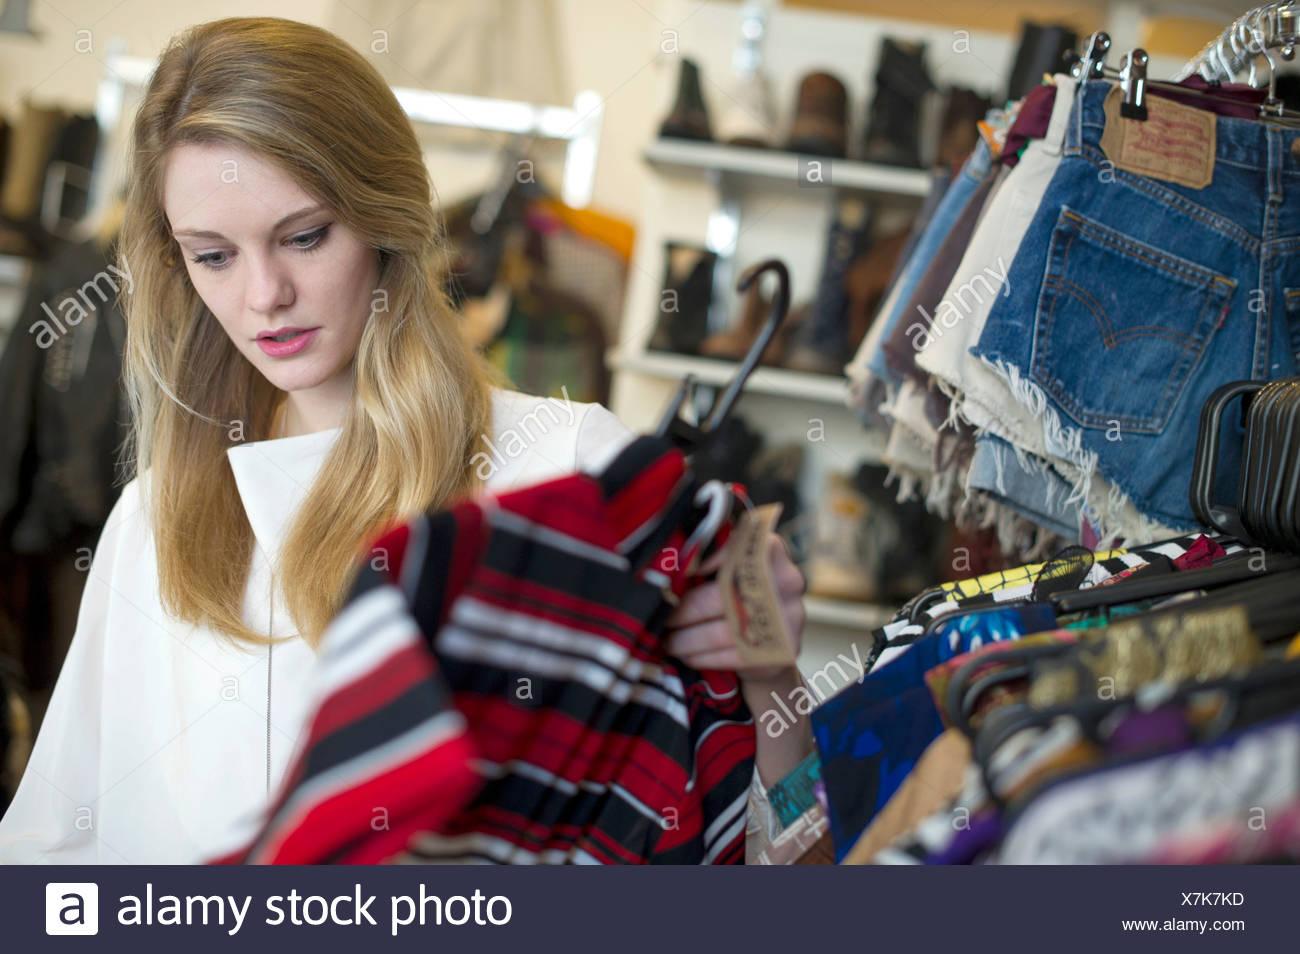 Woman looking at top garment - Stock Image